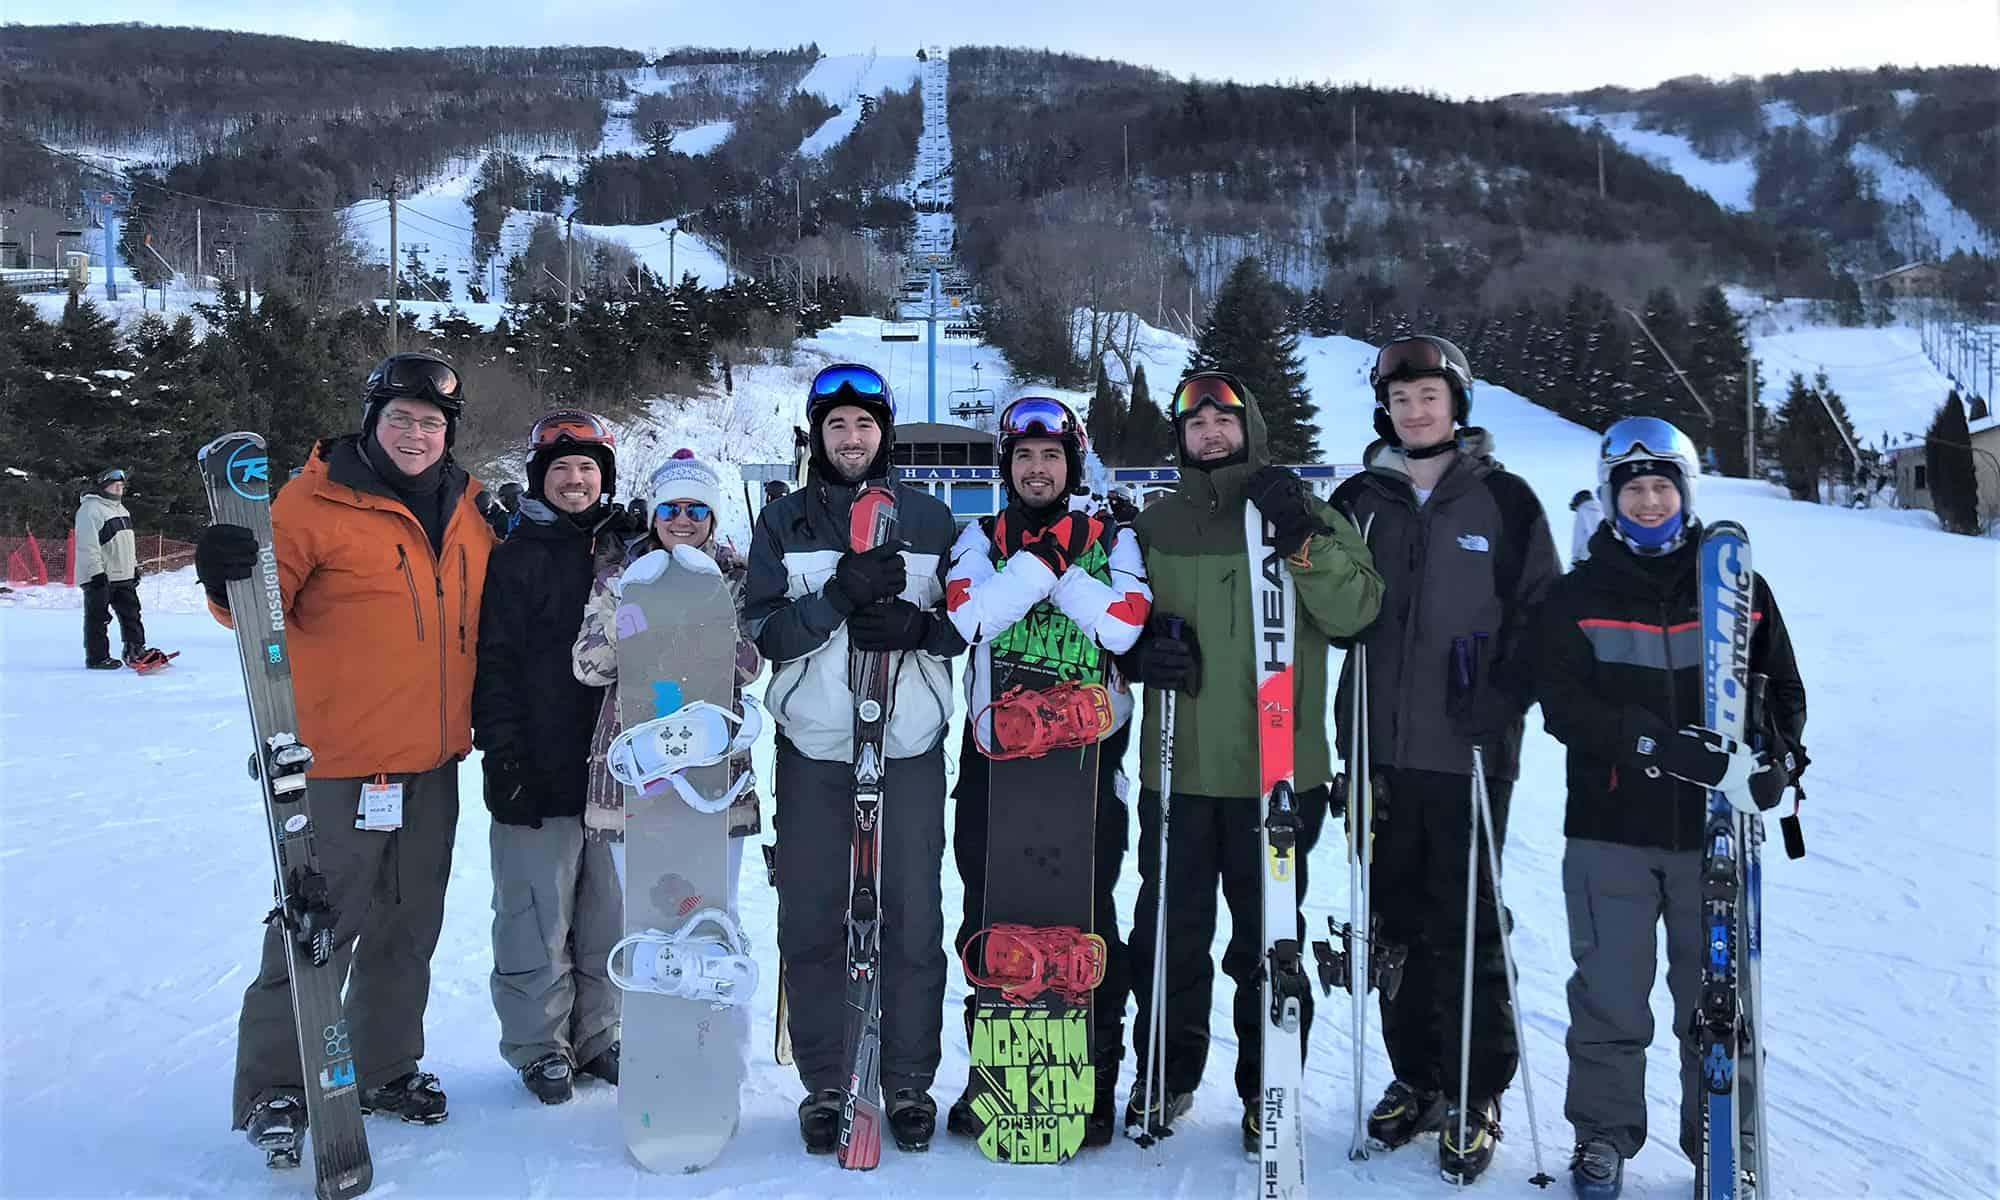 Mulhern-kulp-skiing-2019